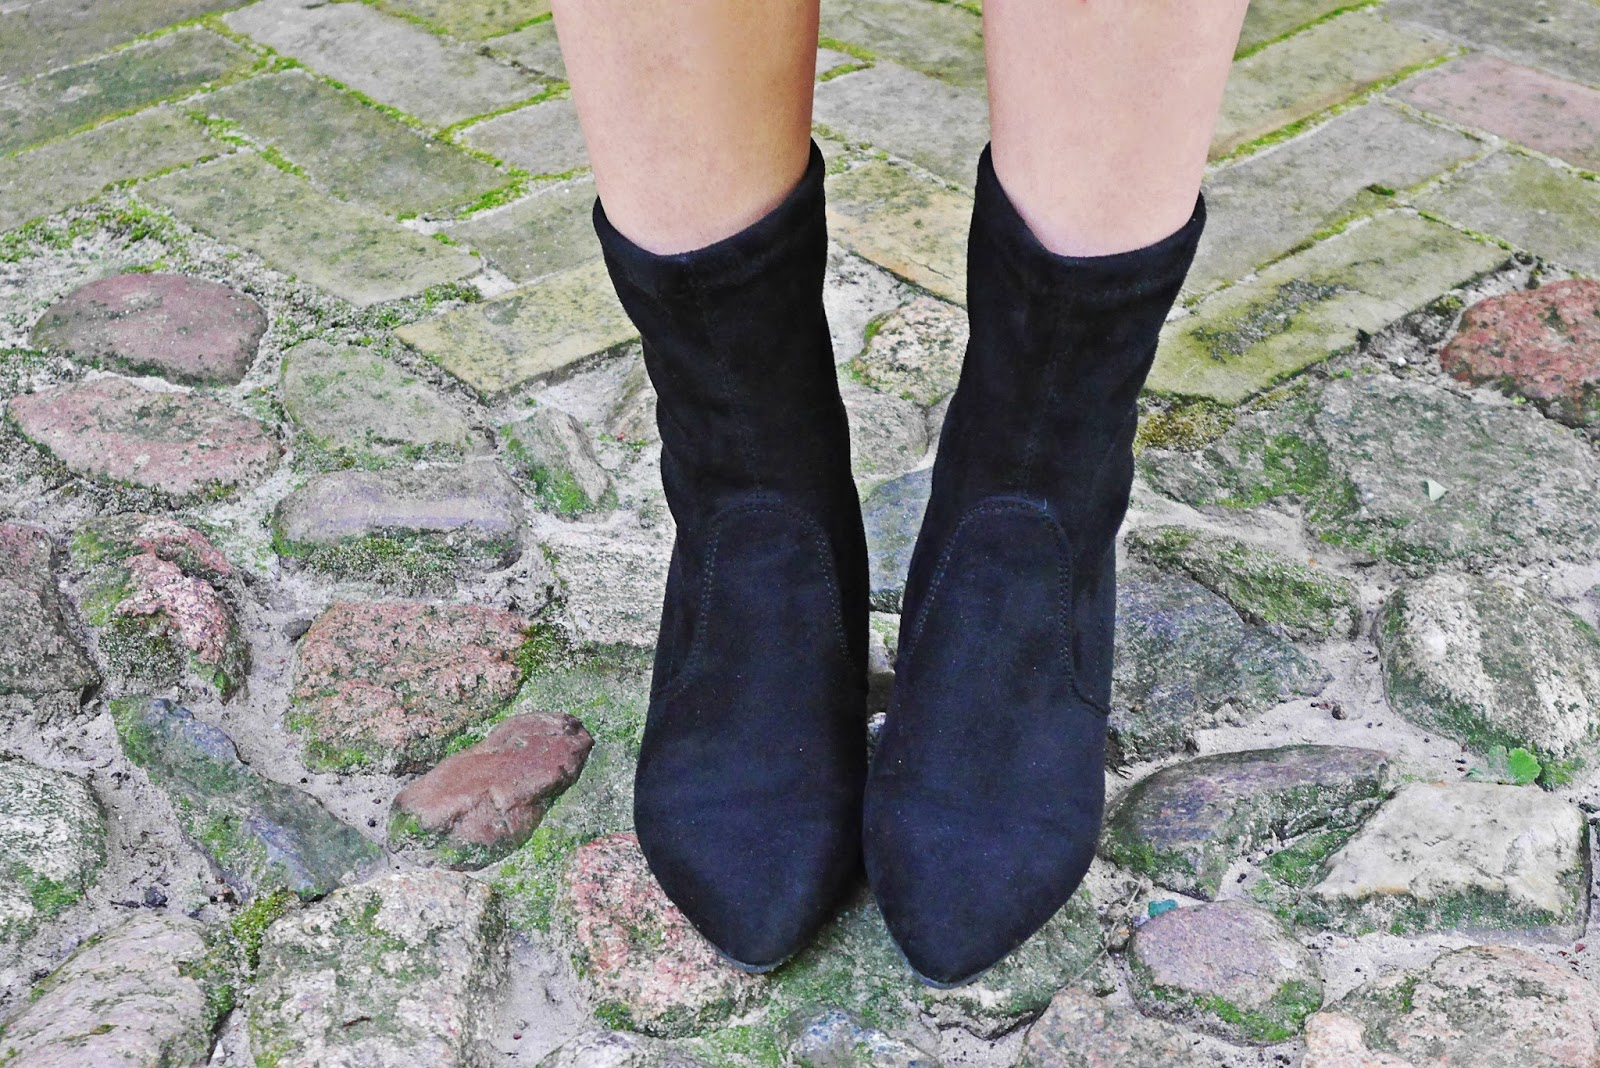 4_flower_sunglass_leather_skirt_socks_shoes_belt_white_top_karyn_blog_modowy_110917afg